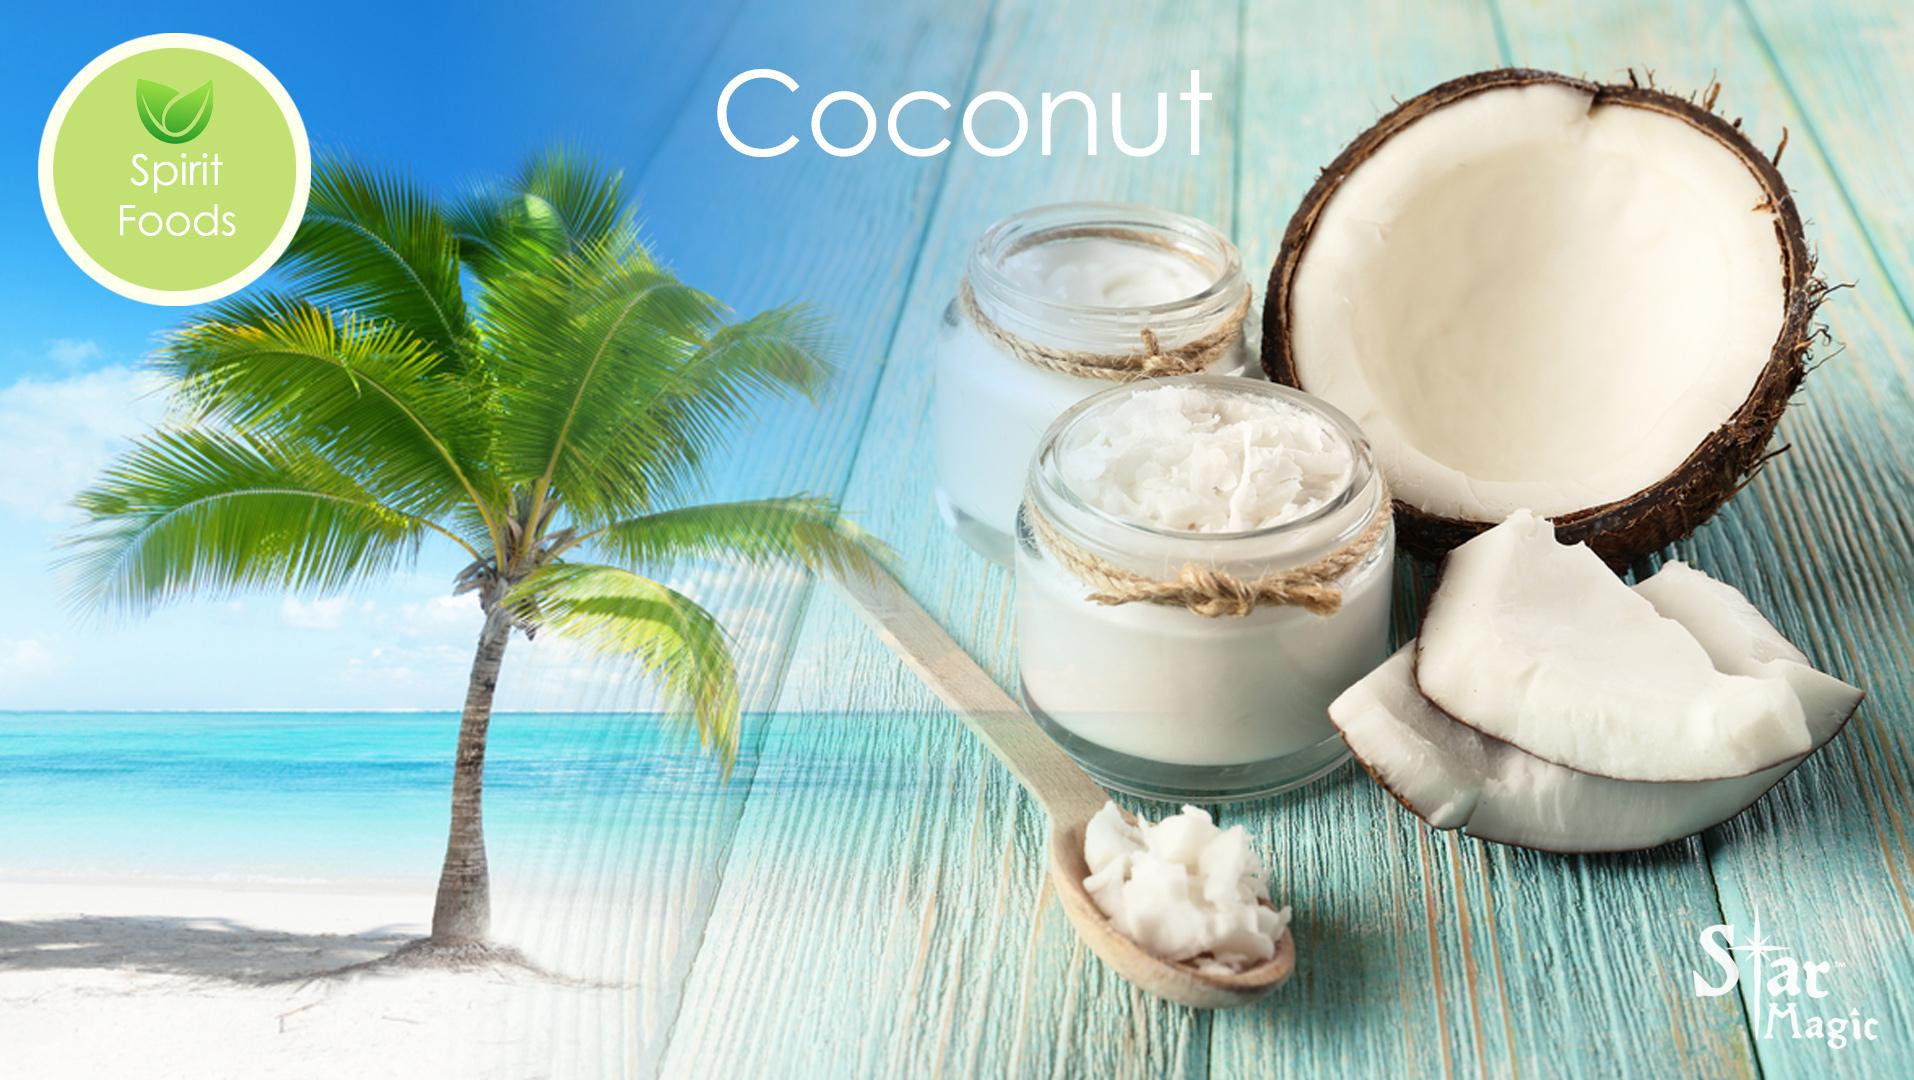 Spirit Food - Coconut - Star Magic